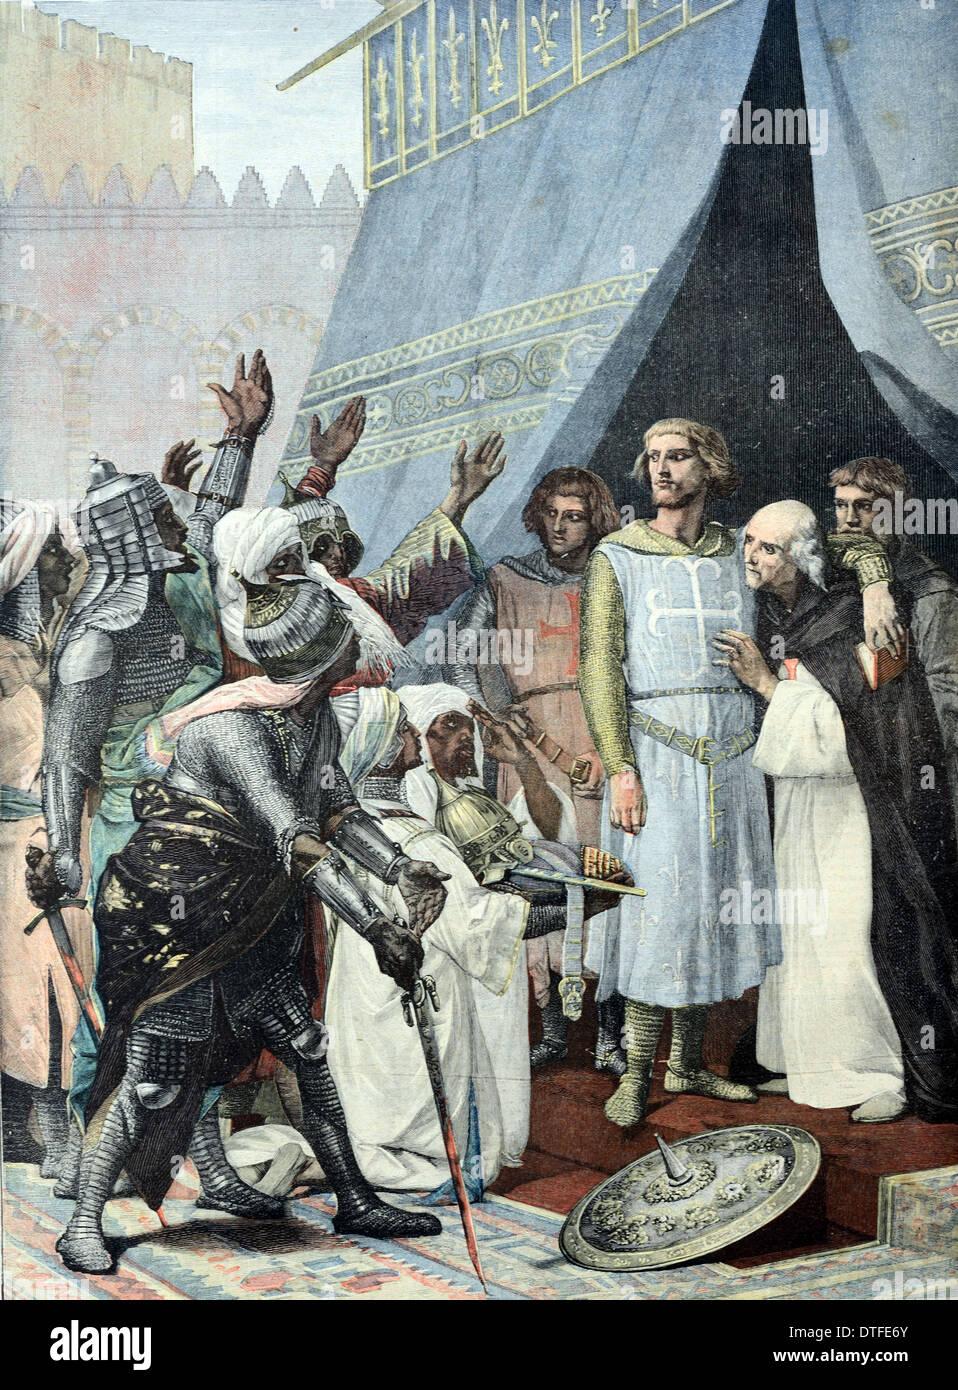 King Louis IX or Saint Louis IX Catholic Saint & King of France (1214-1270) in Jerusalem during Seventh Crusade (c1248) Stock Photo